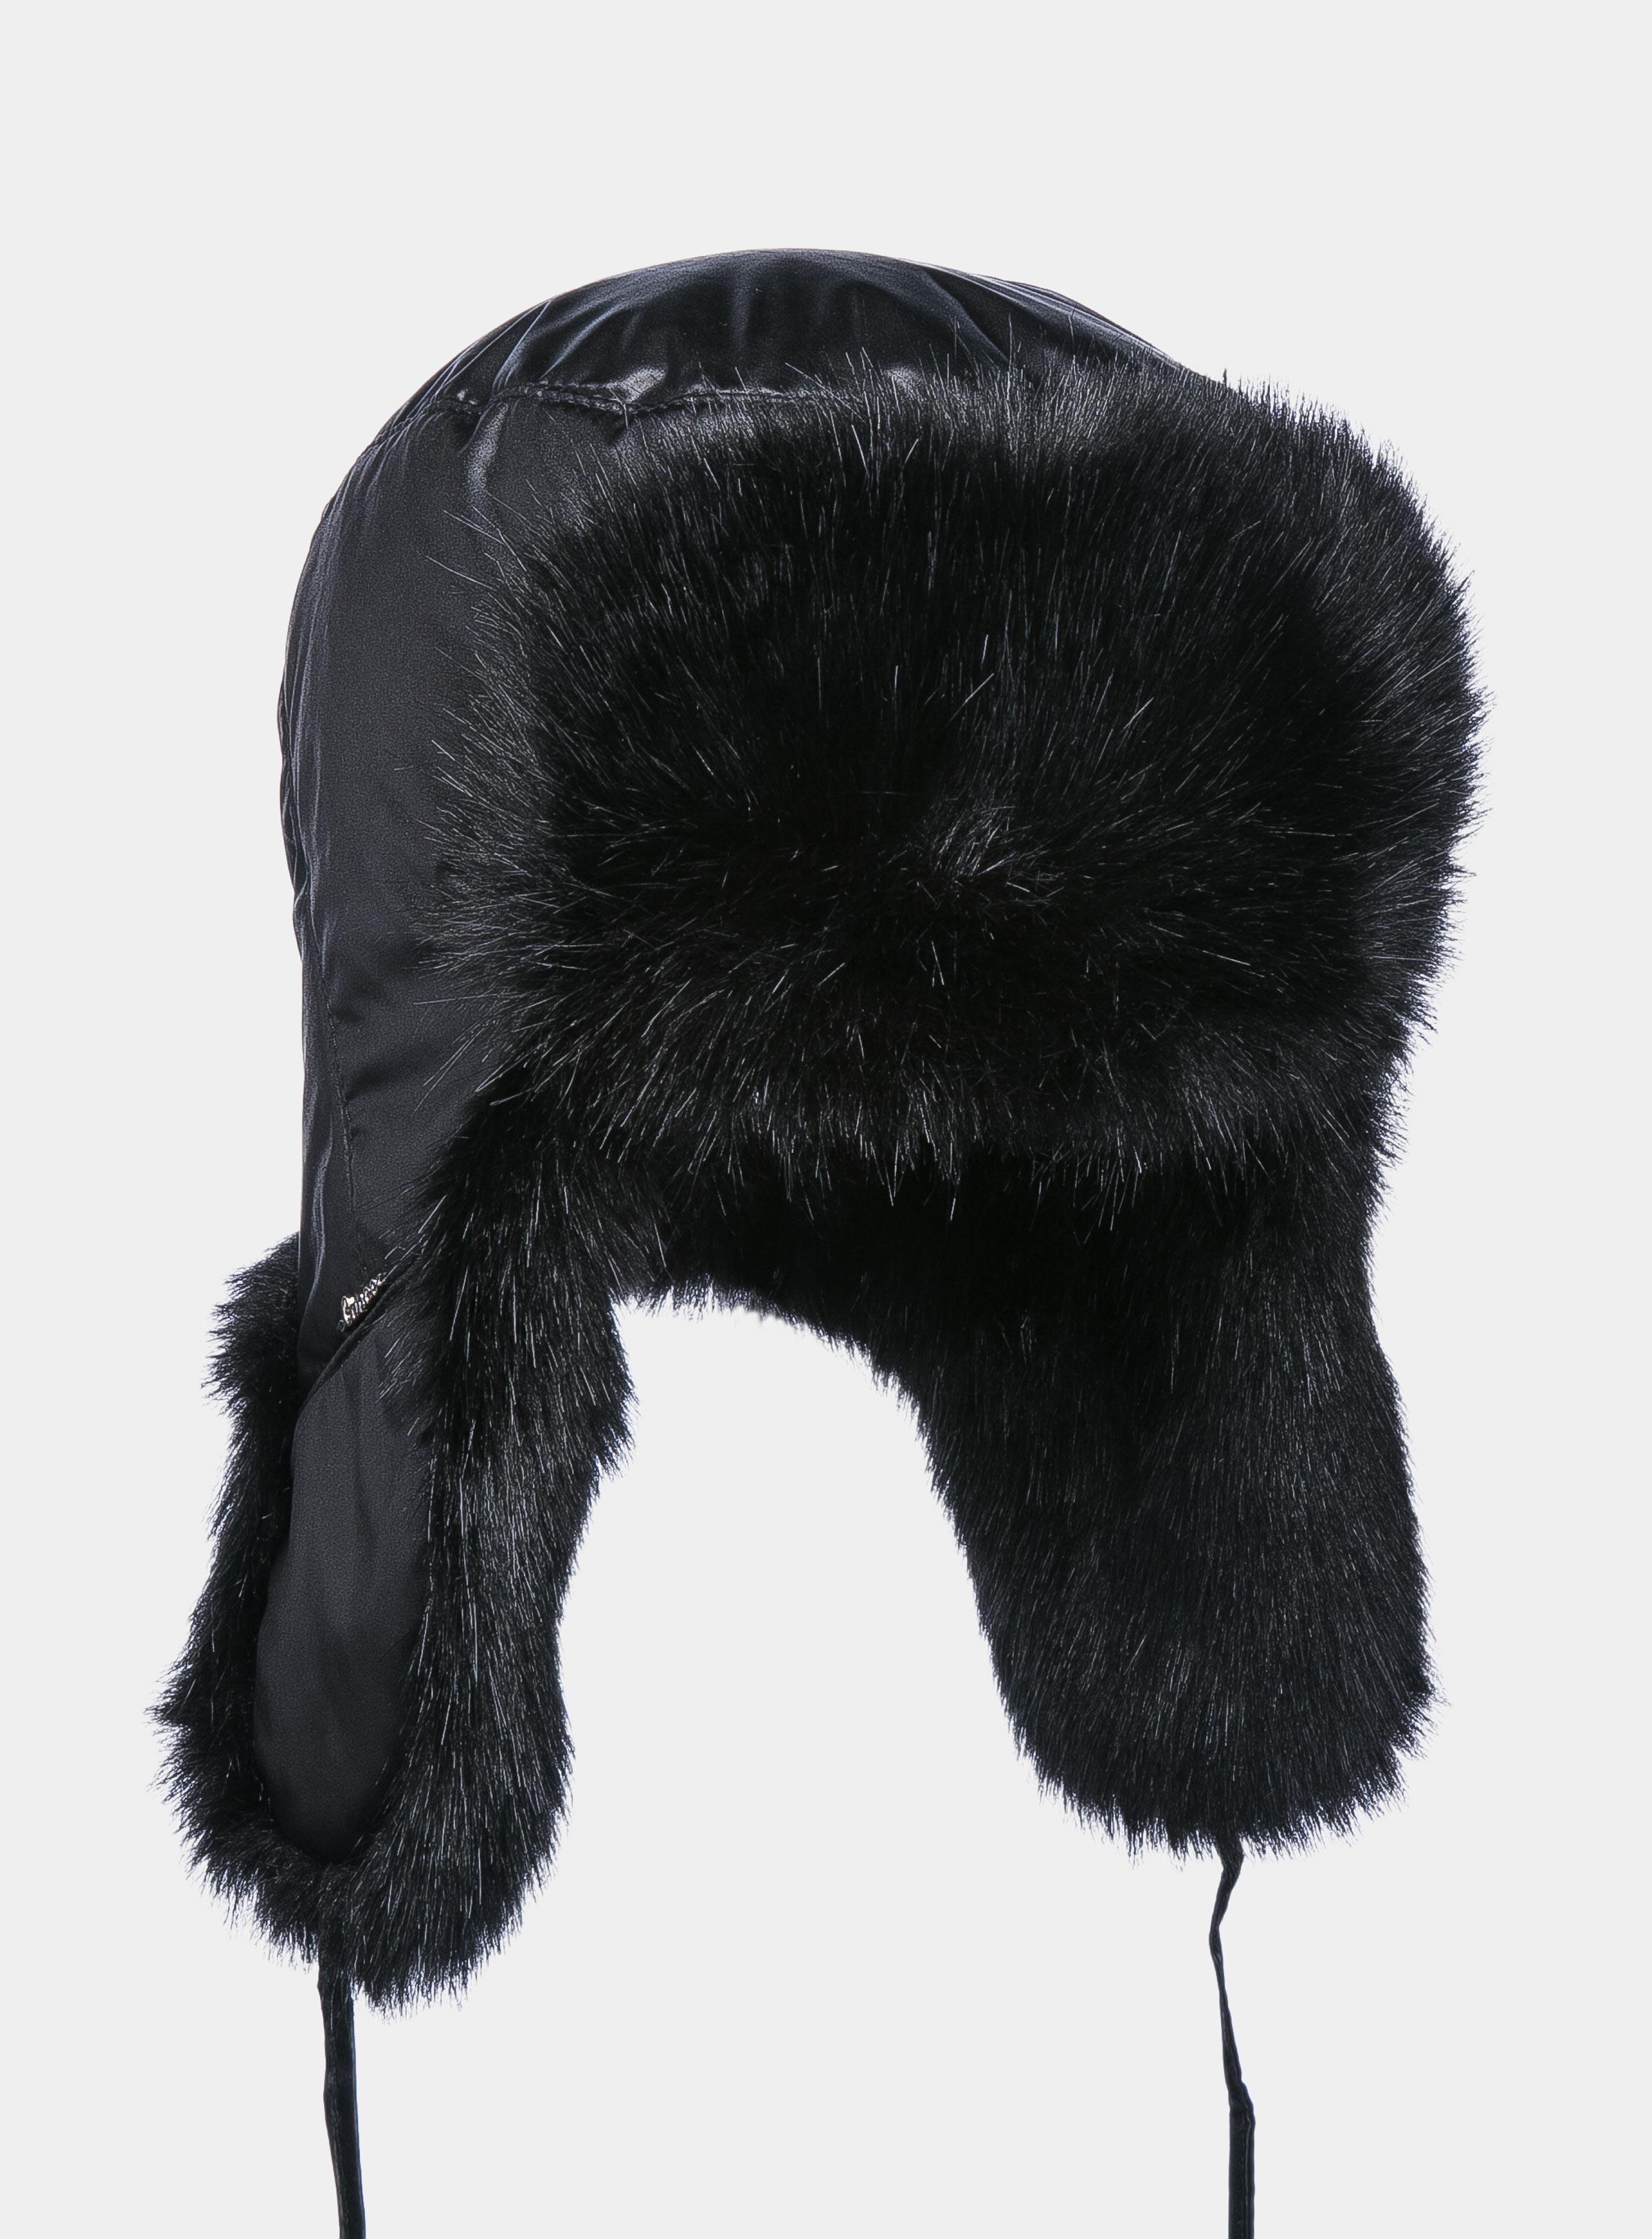 Earflap hat Canoe 3443101 for women 2017 winter beanies bicycle windproof motorcycle face mask hat neck helmet cap thermal fleece balaclava hat for men women